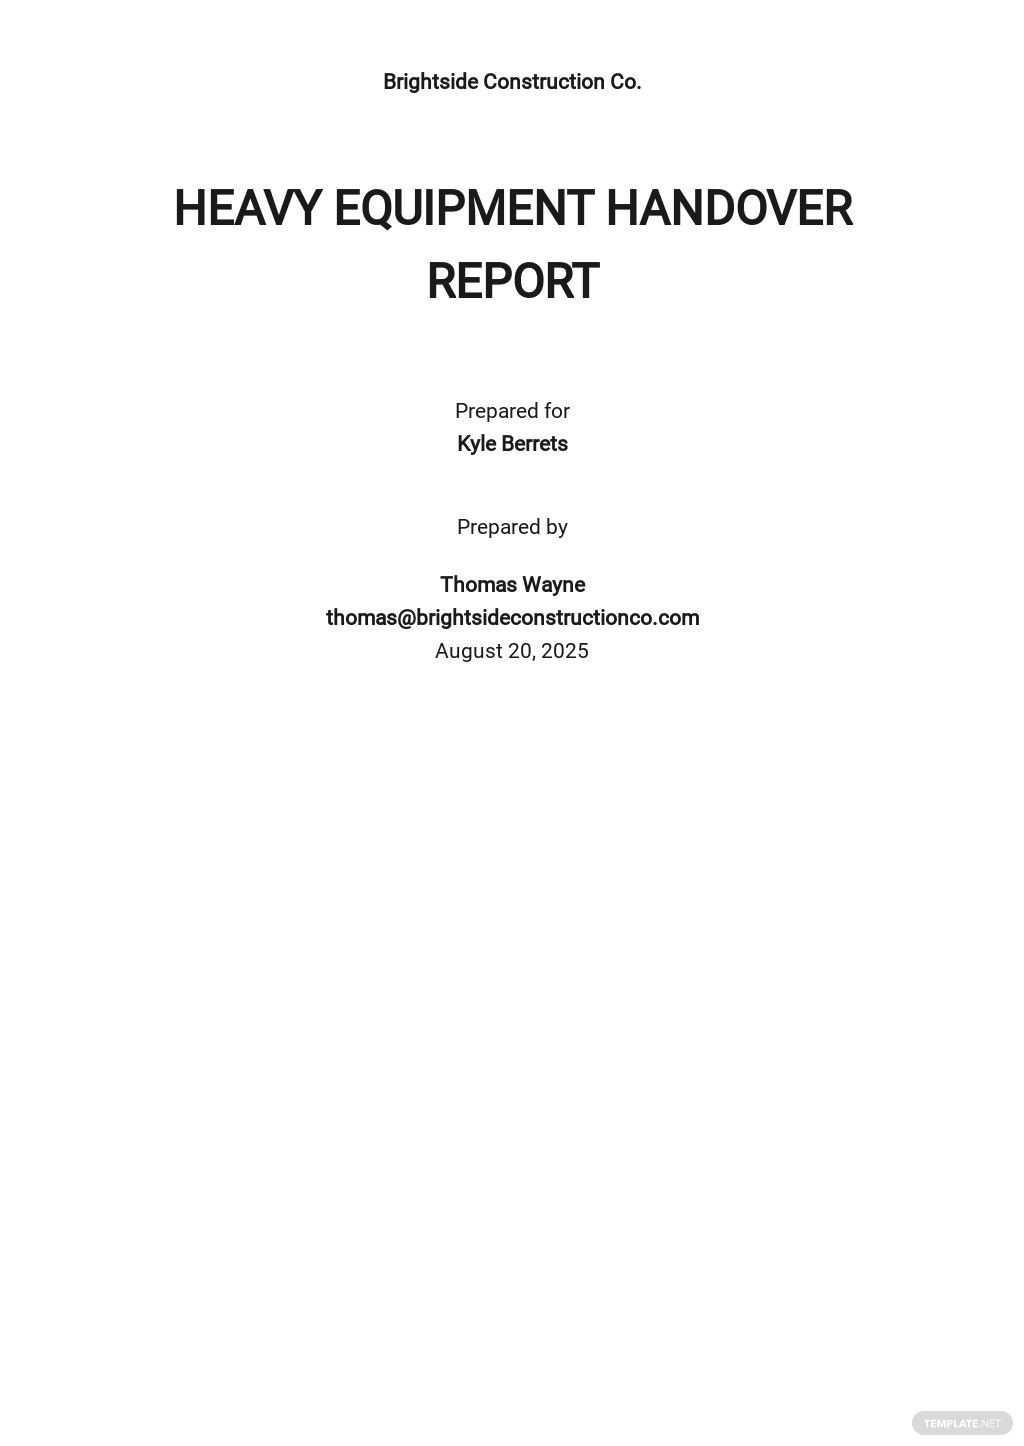 Free Equipment Handover Report Template.jpe